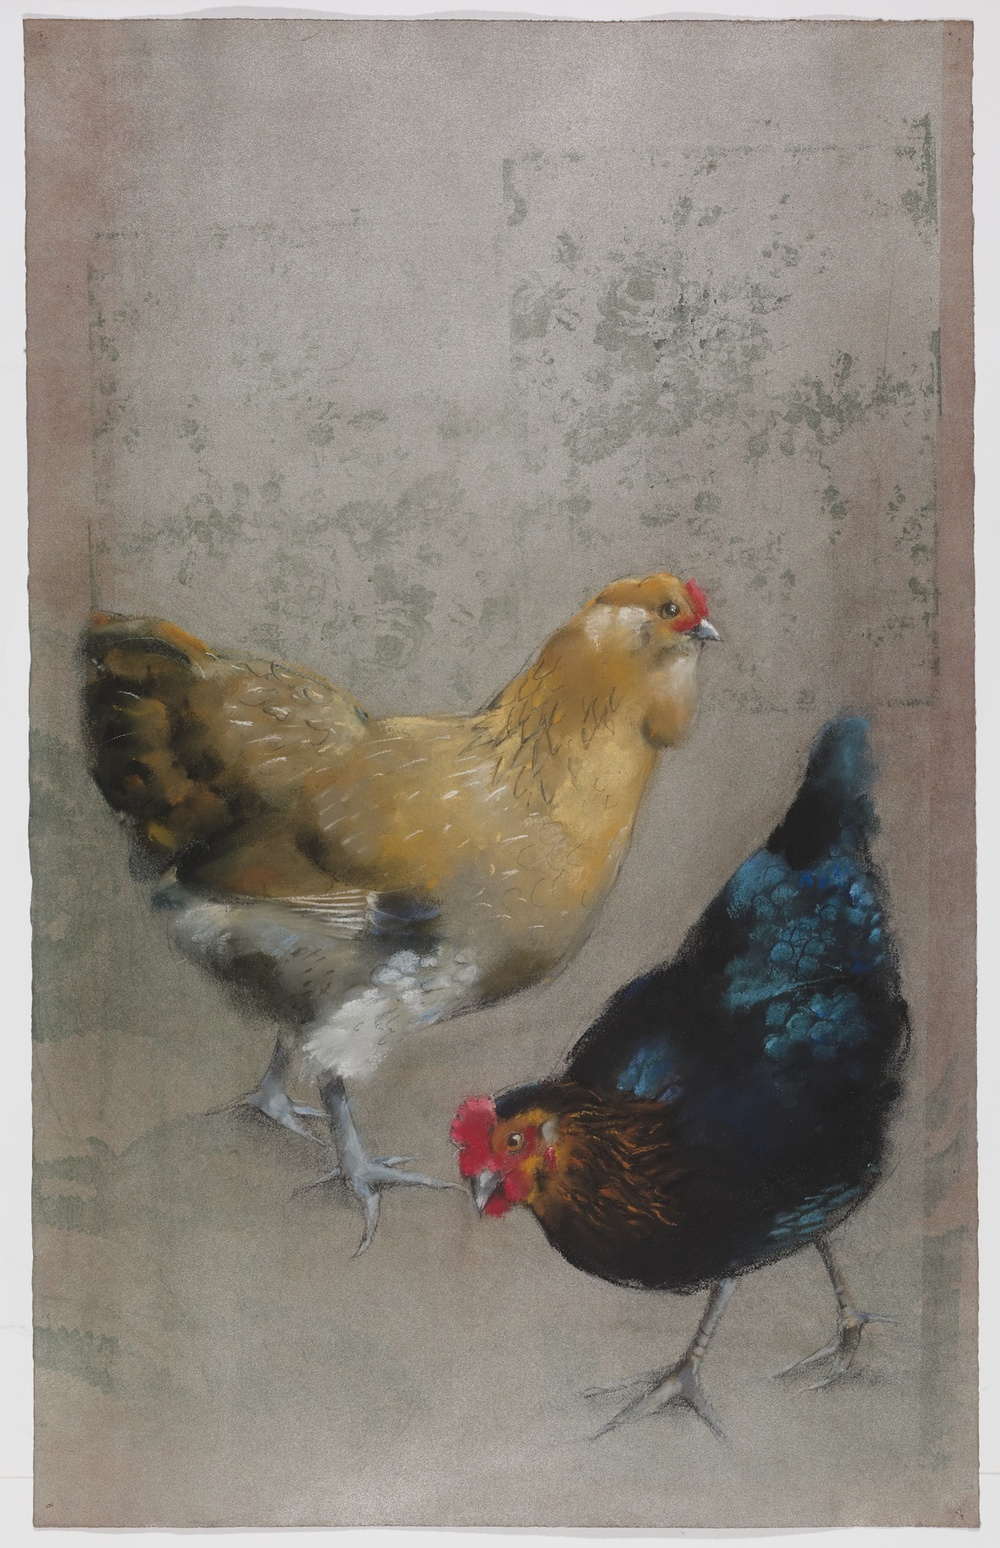 2 Chickens #14